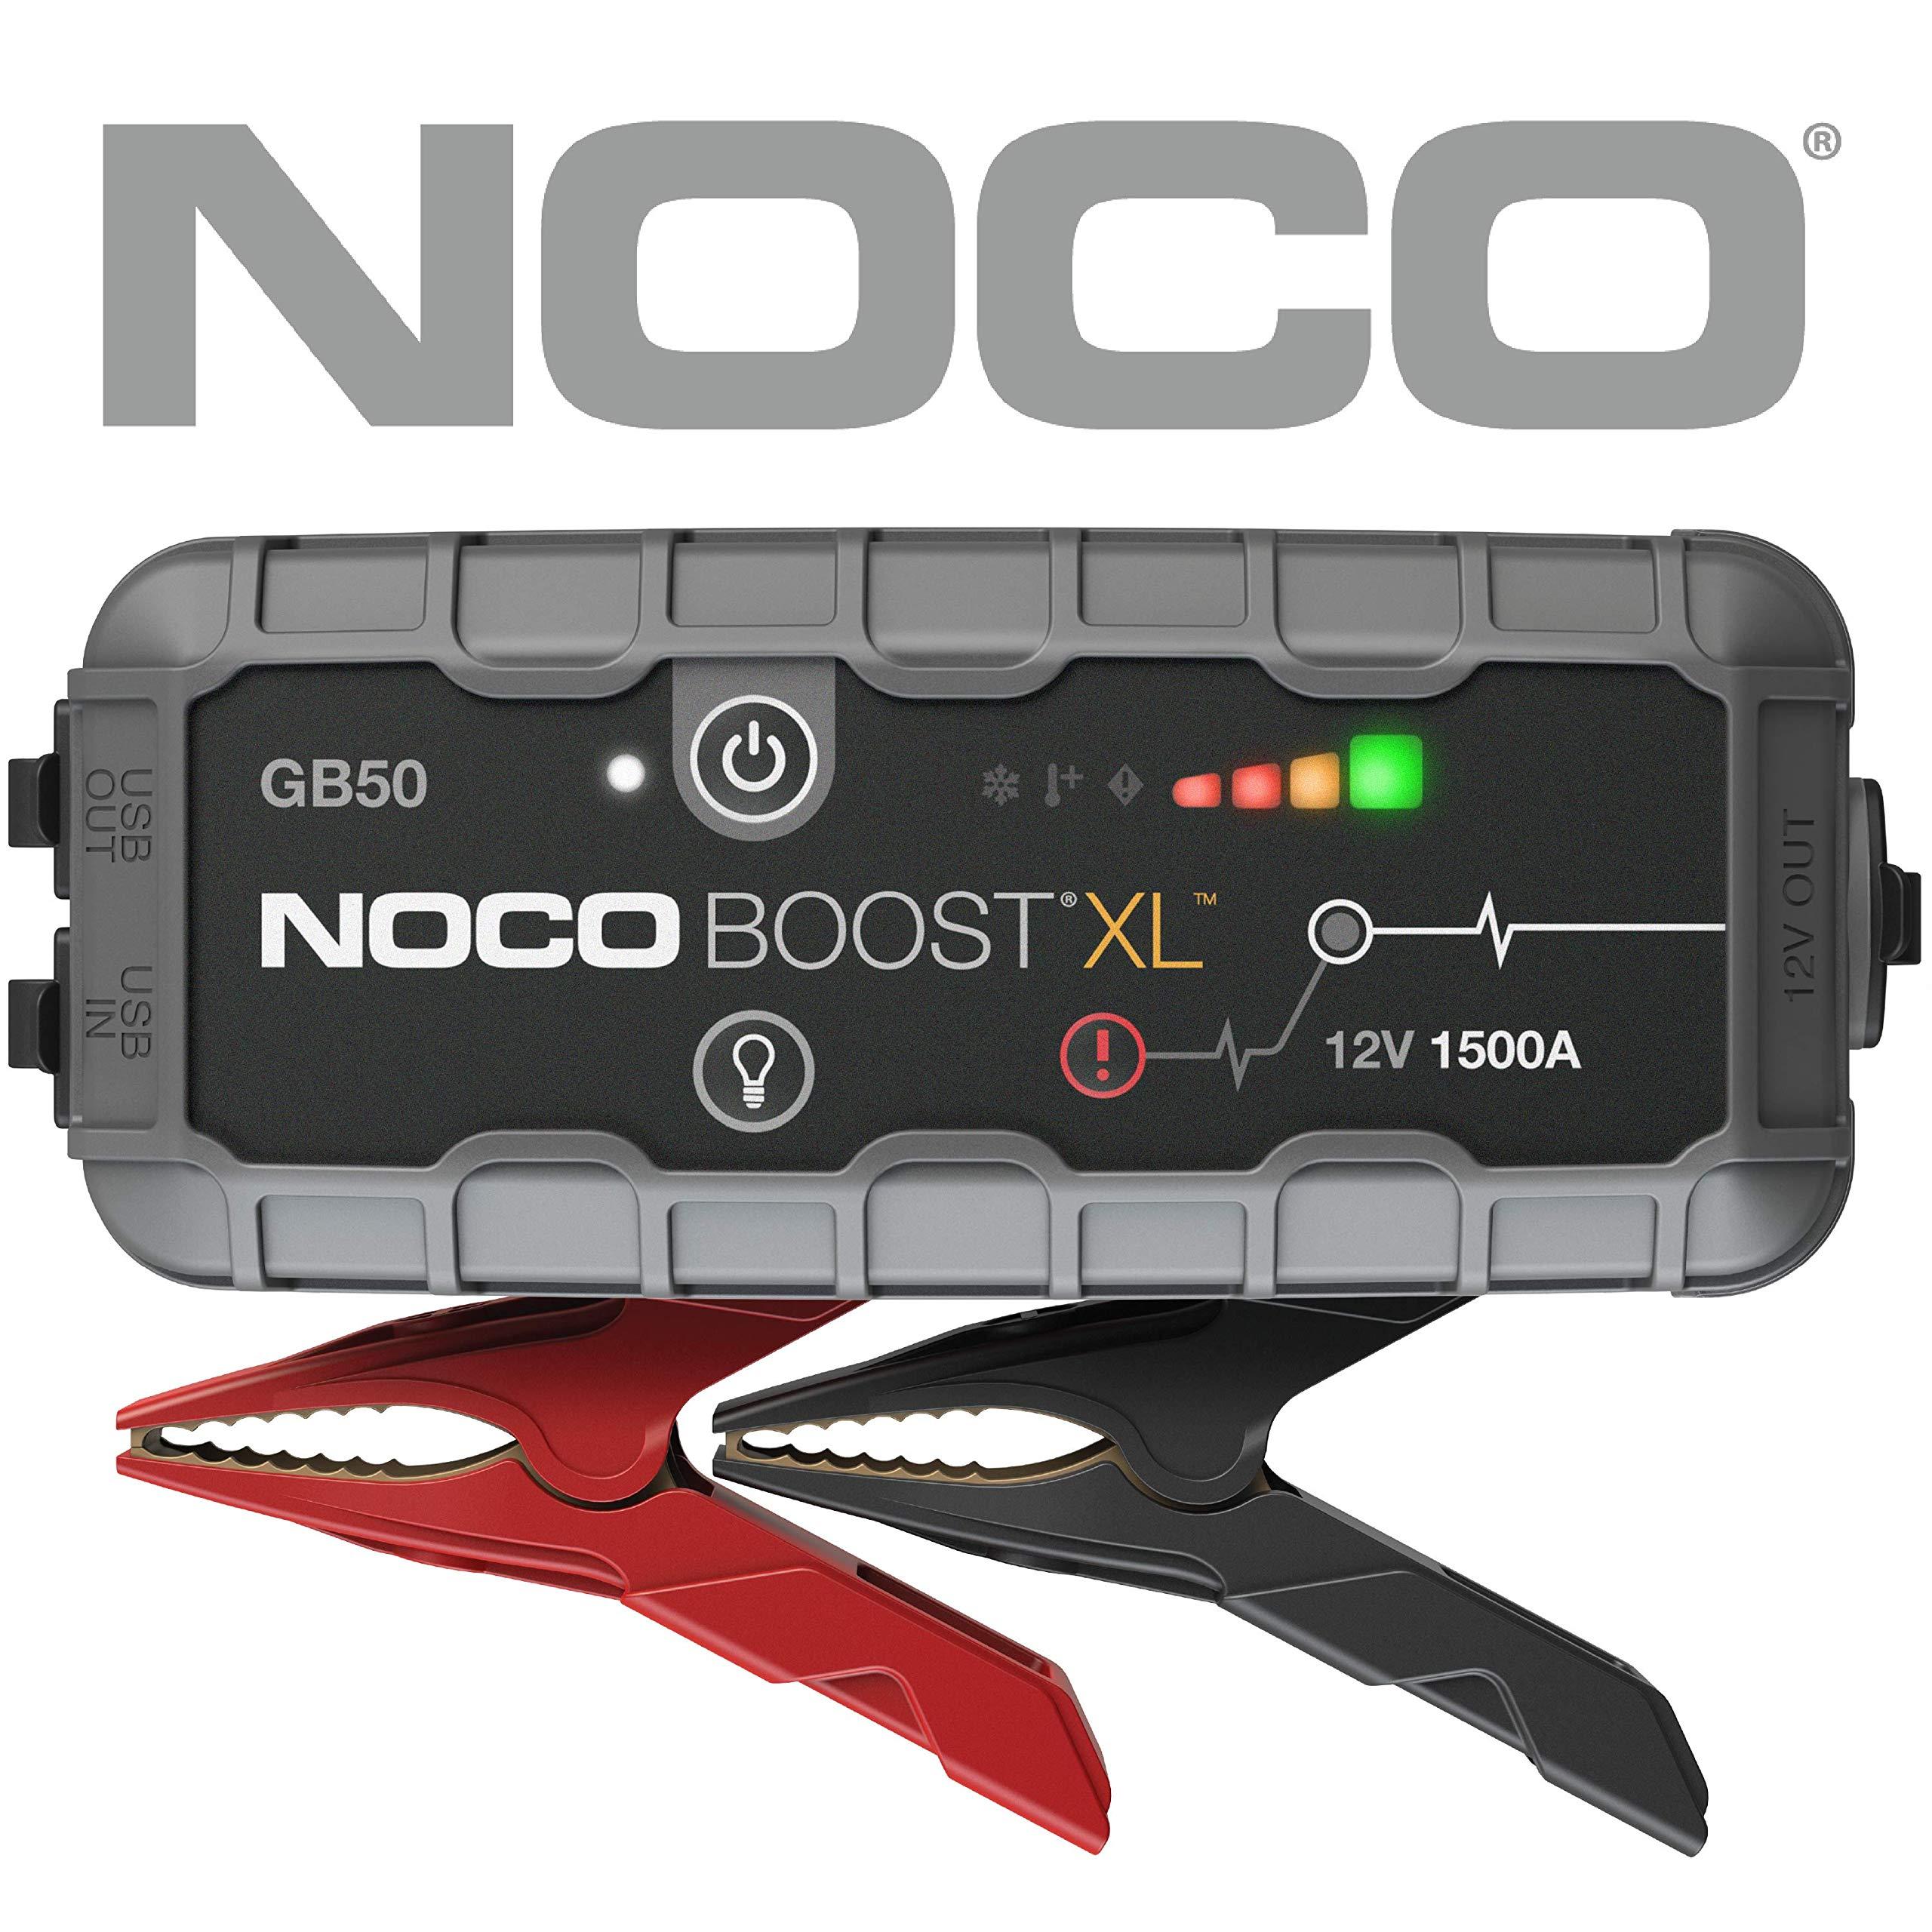 NOCO Boost XL GB50 1500 Amp 12V UltraSafe Lithium Jump Starter